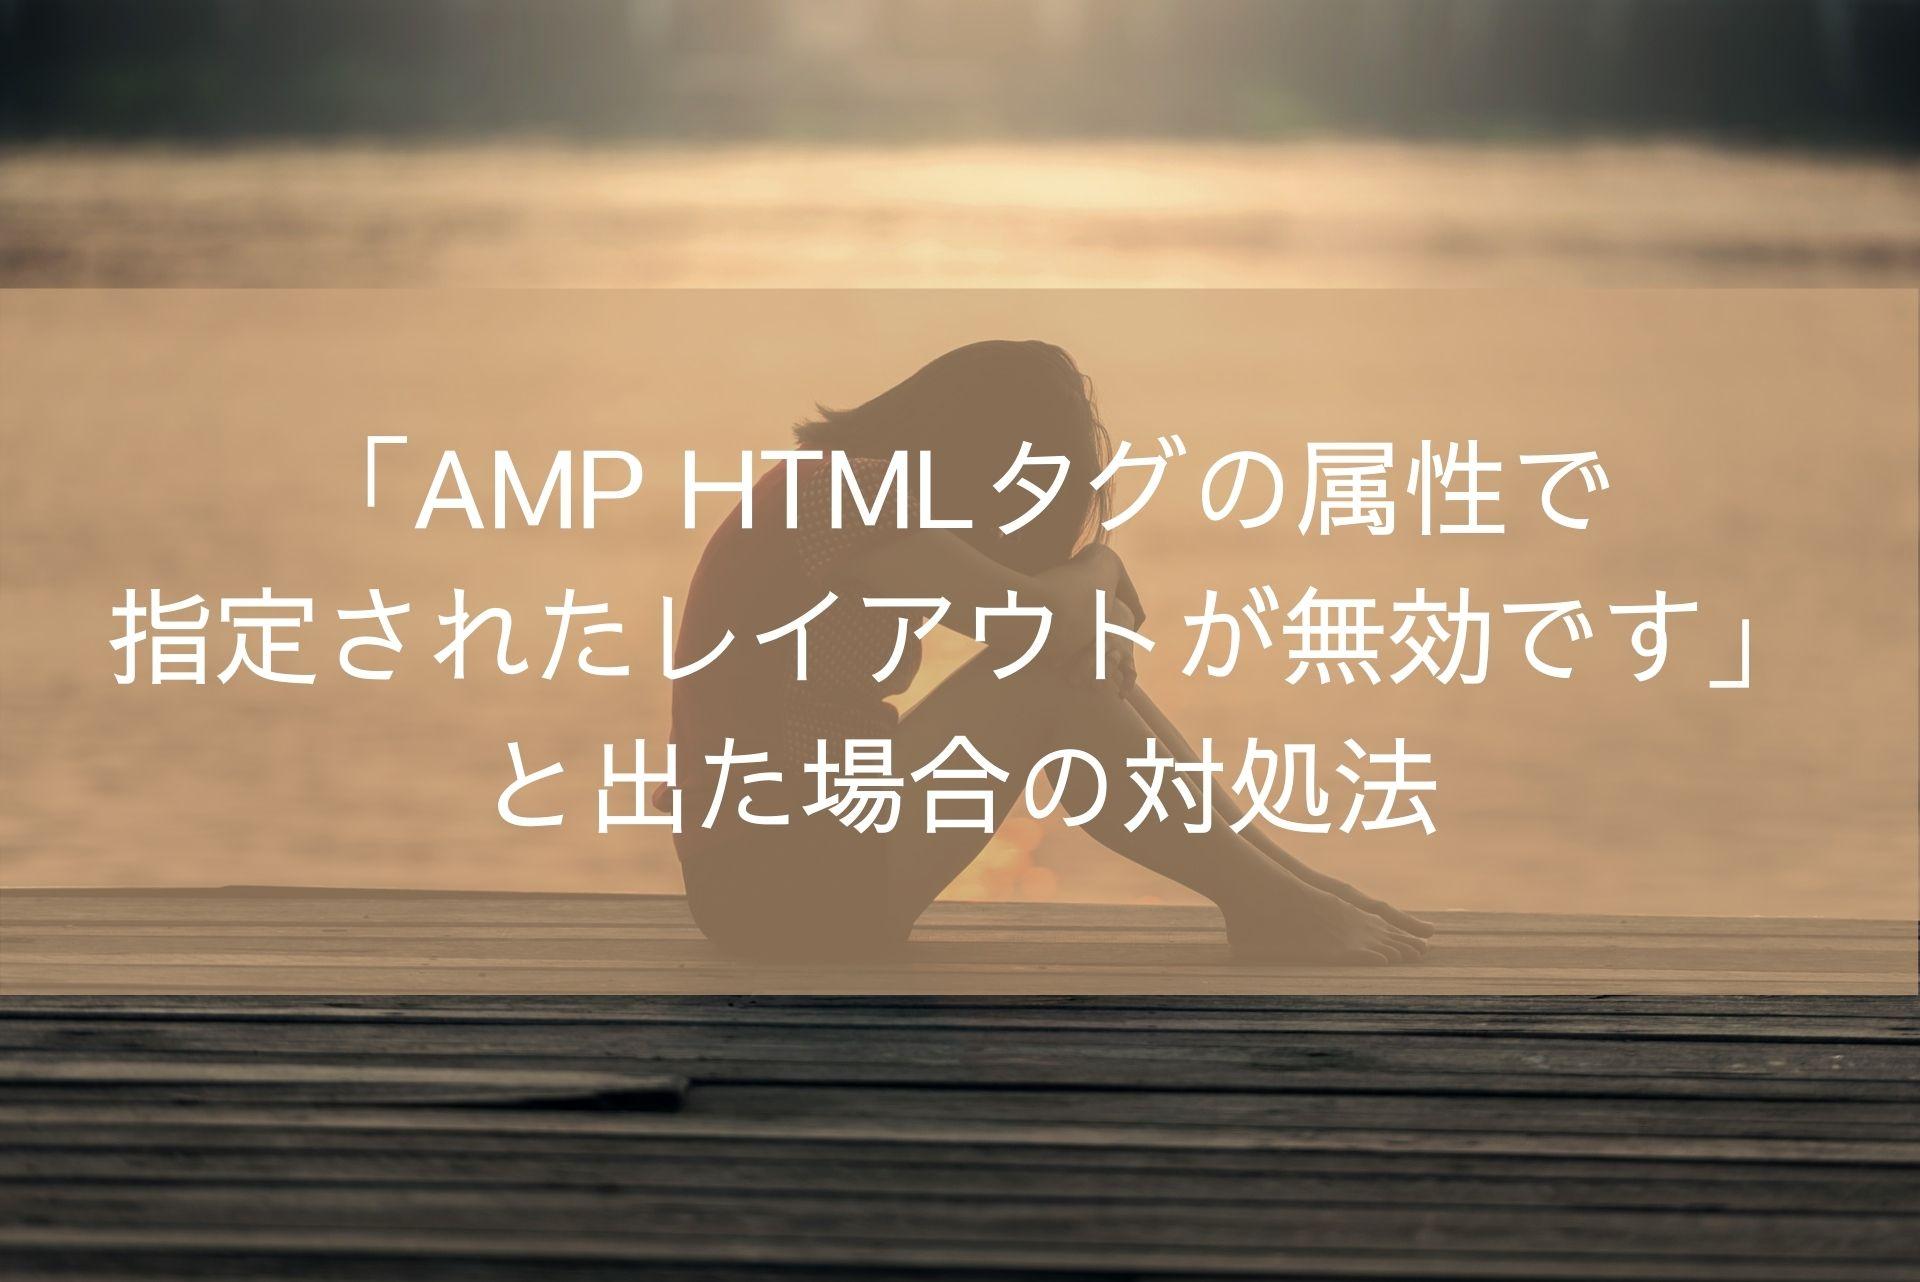 「AMP HTMLタグの属性で 指定されたレイアウトが無効です」 と出た場合の対処法